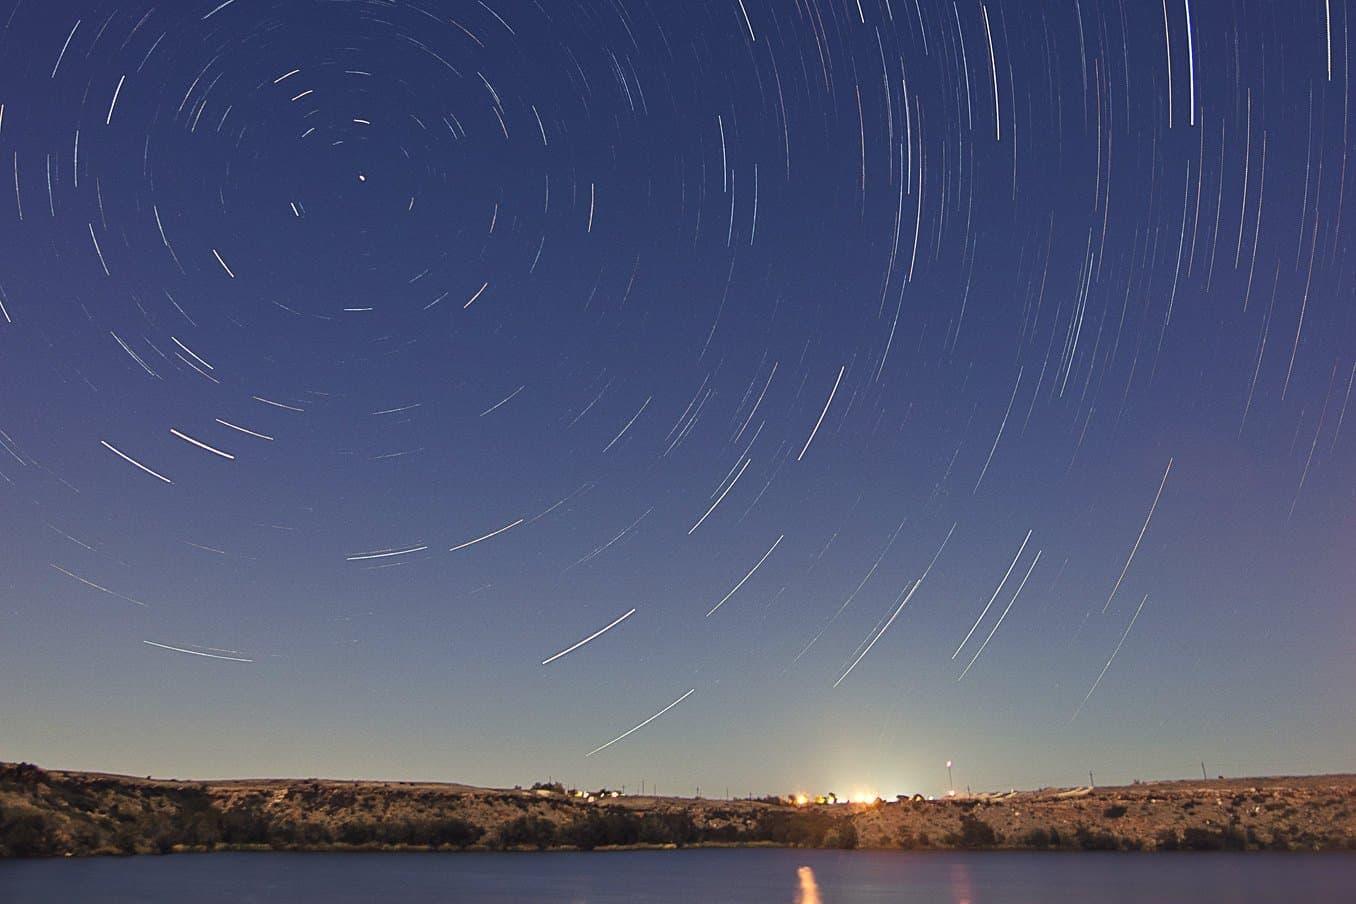 Stargazing in Texas - Terry Presley via Flickr 2